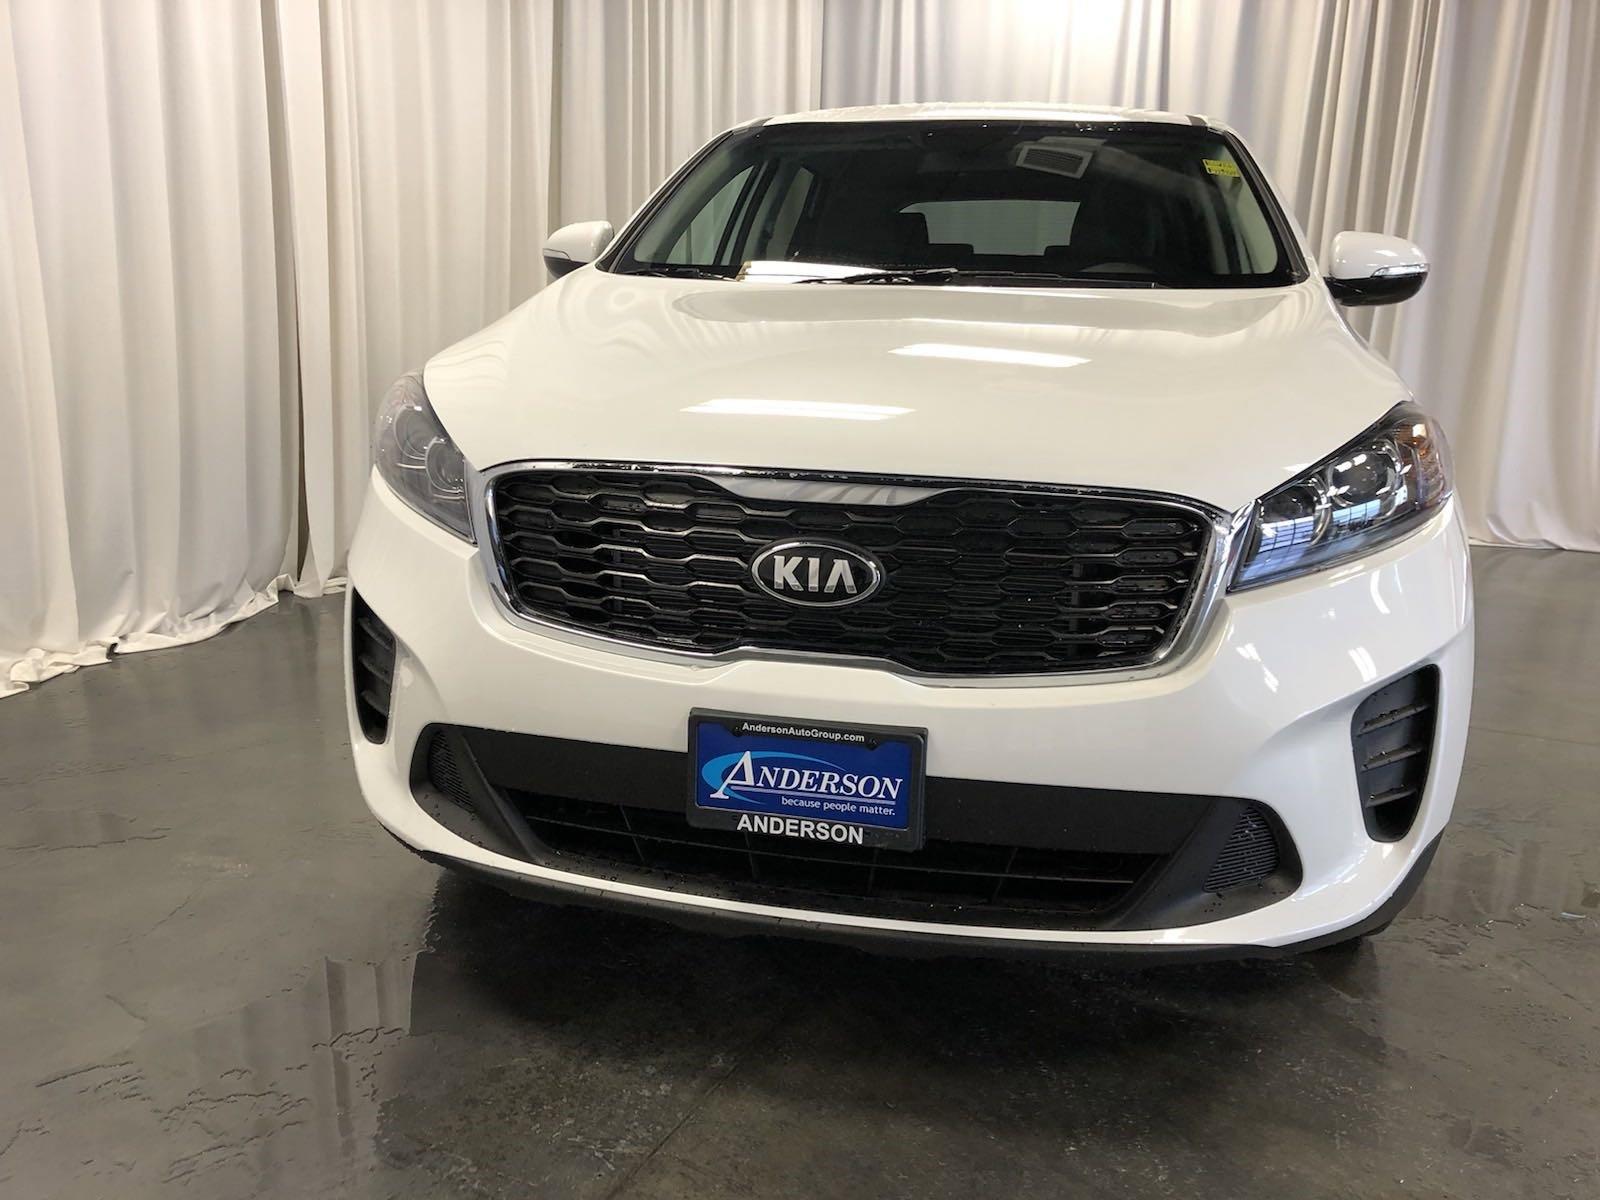 New 2020 Kia Sorento L Sport Utility for sale in St Joseph MO